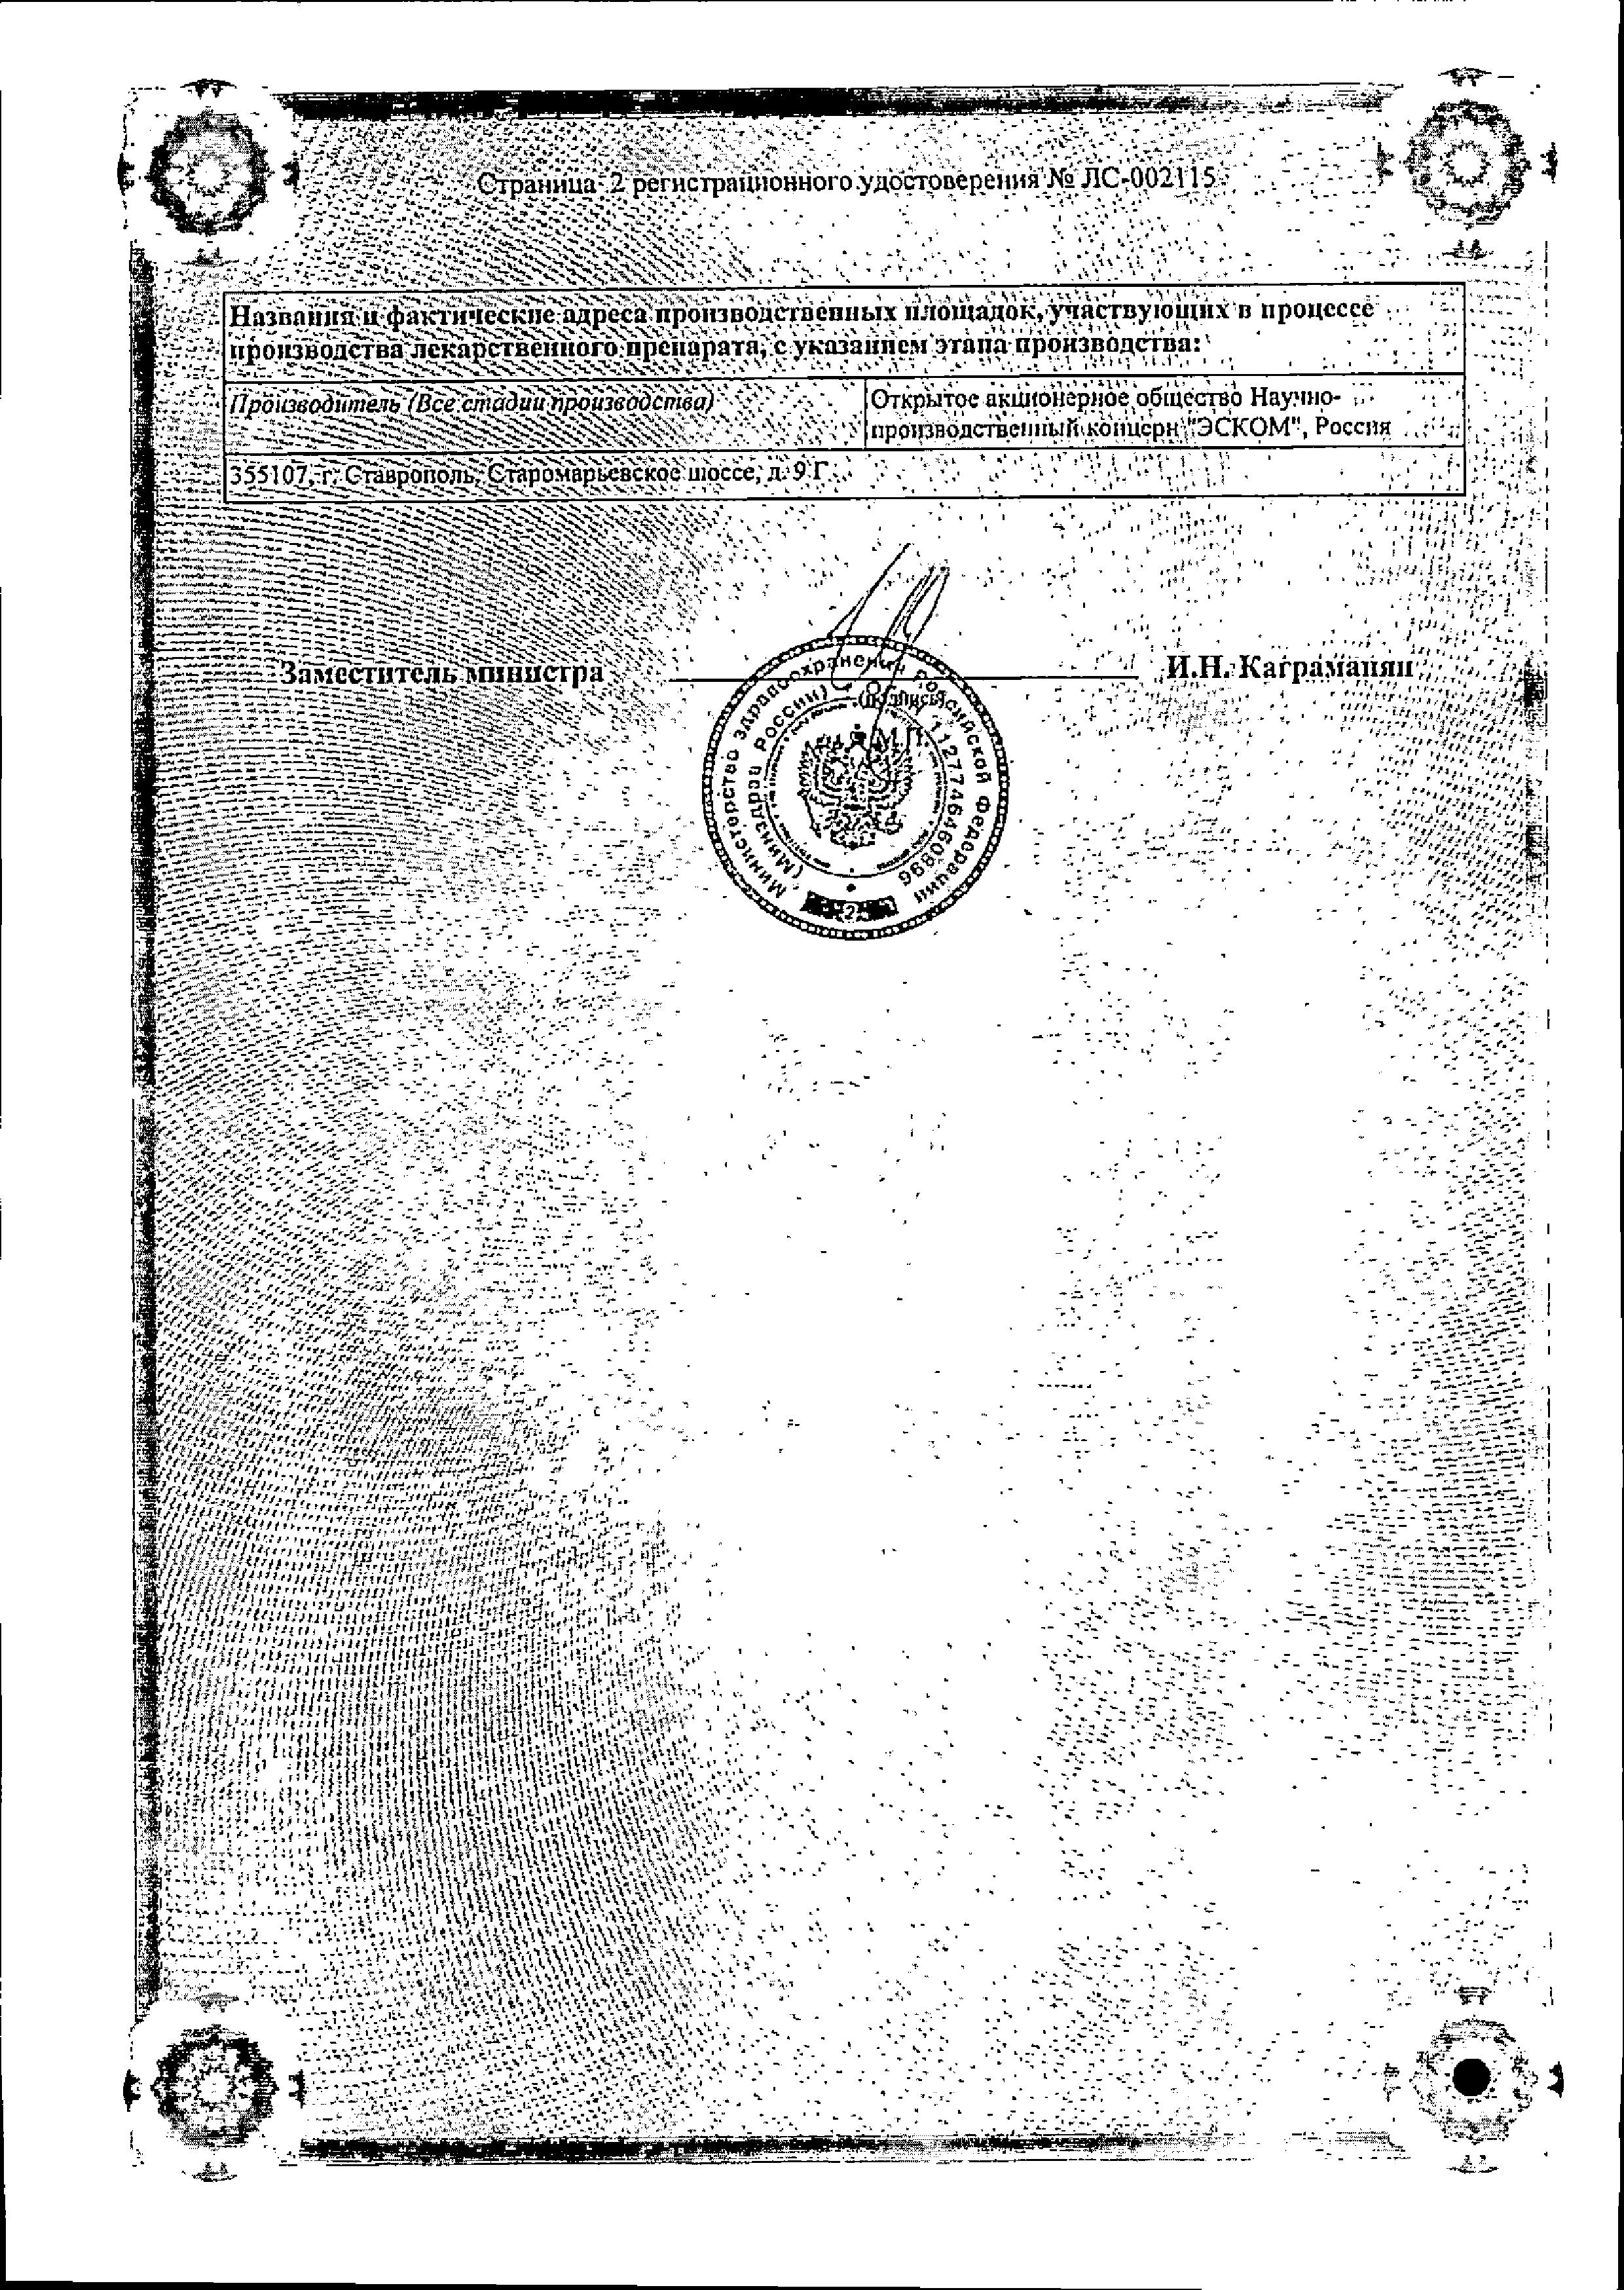 Гемодез-Н сертификат